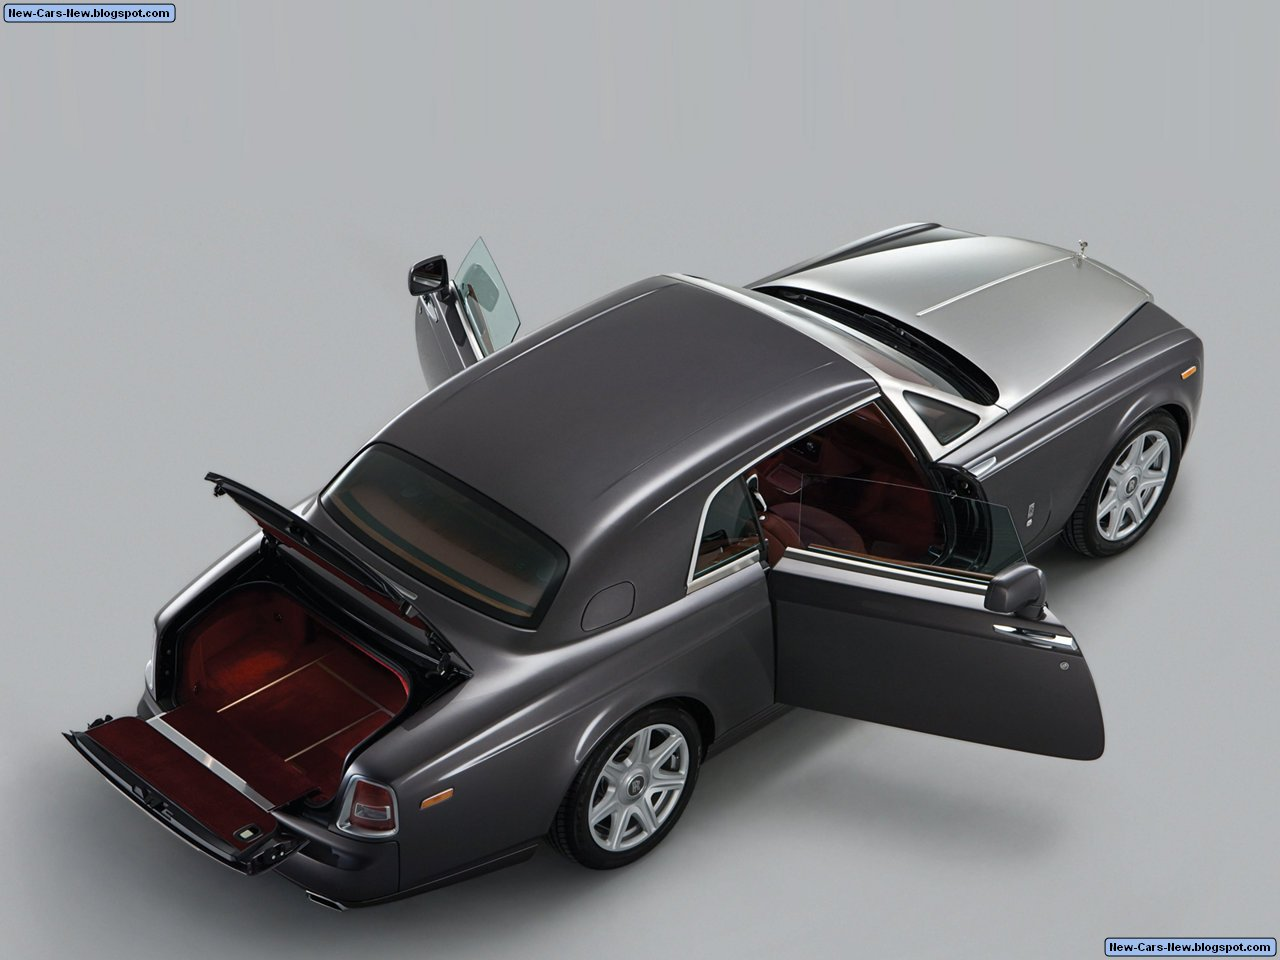 Rolls-Royce Phantom Coupe (2009)